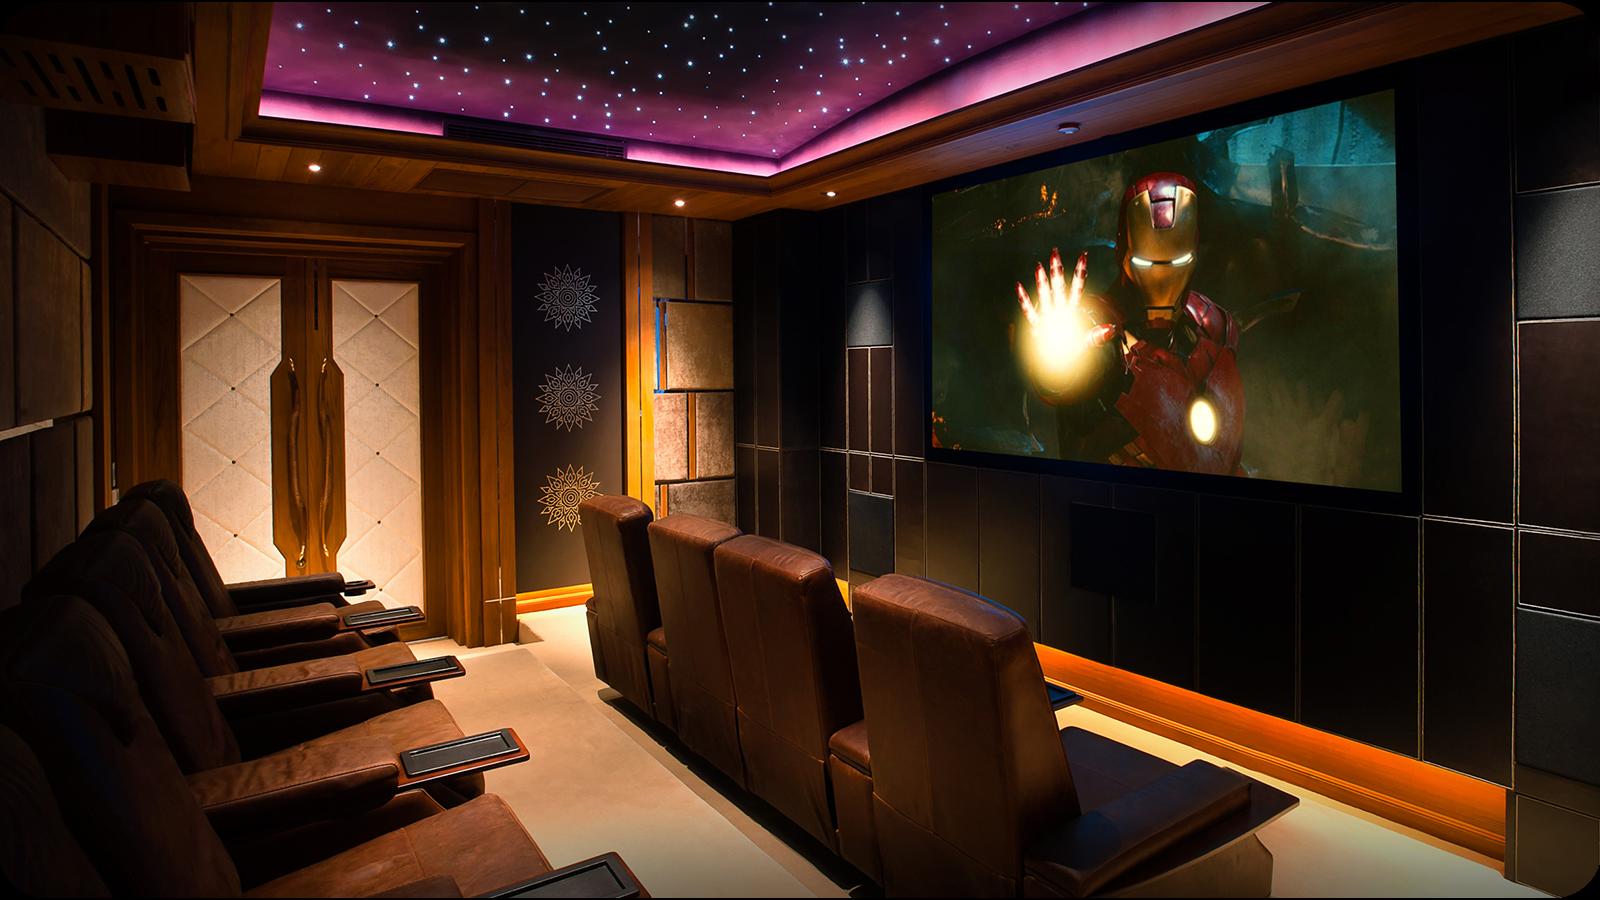 Home Cinema in Thailand 1